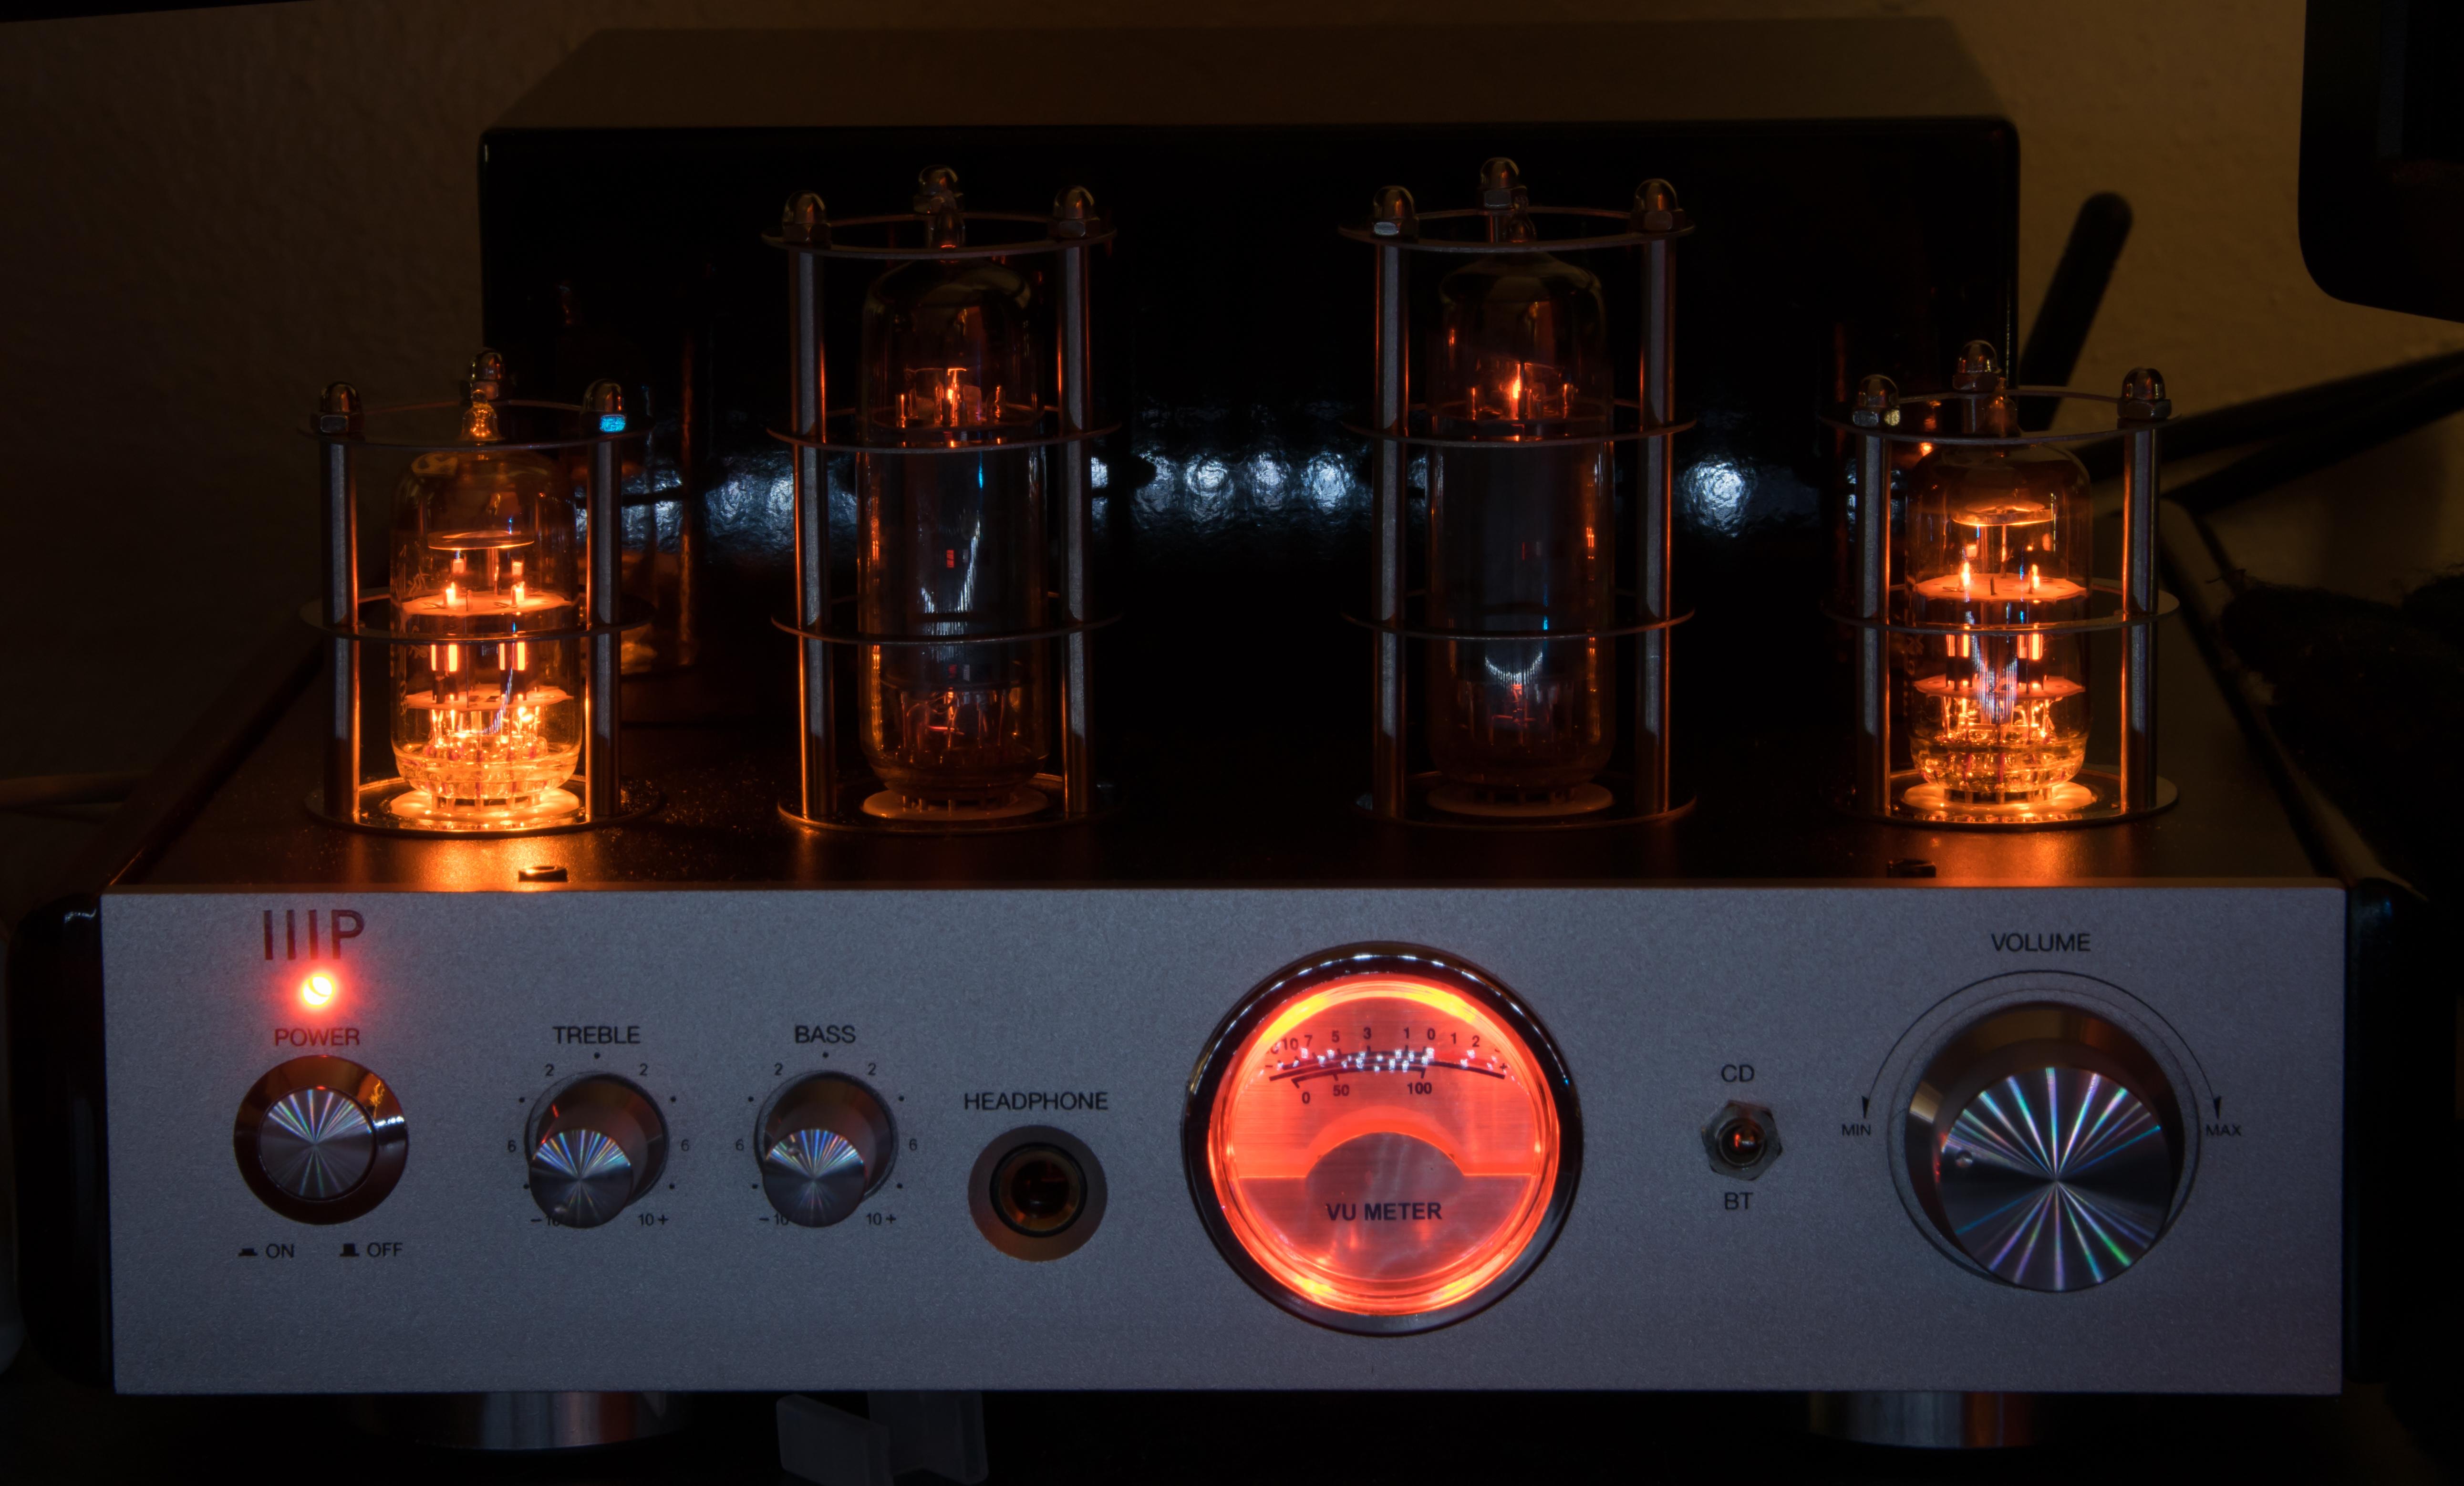 Monoprice 113194 25 Watt Ab Power Amplifier Stereo Hybrid Tube Amp 50 Watts Audio Dsc 2250